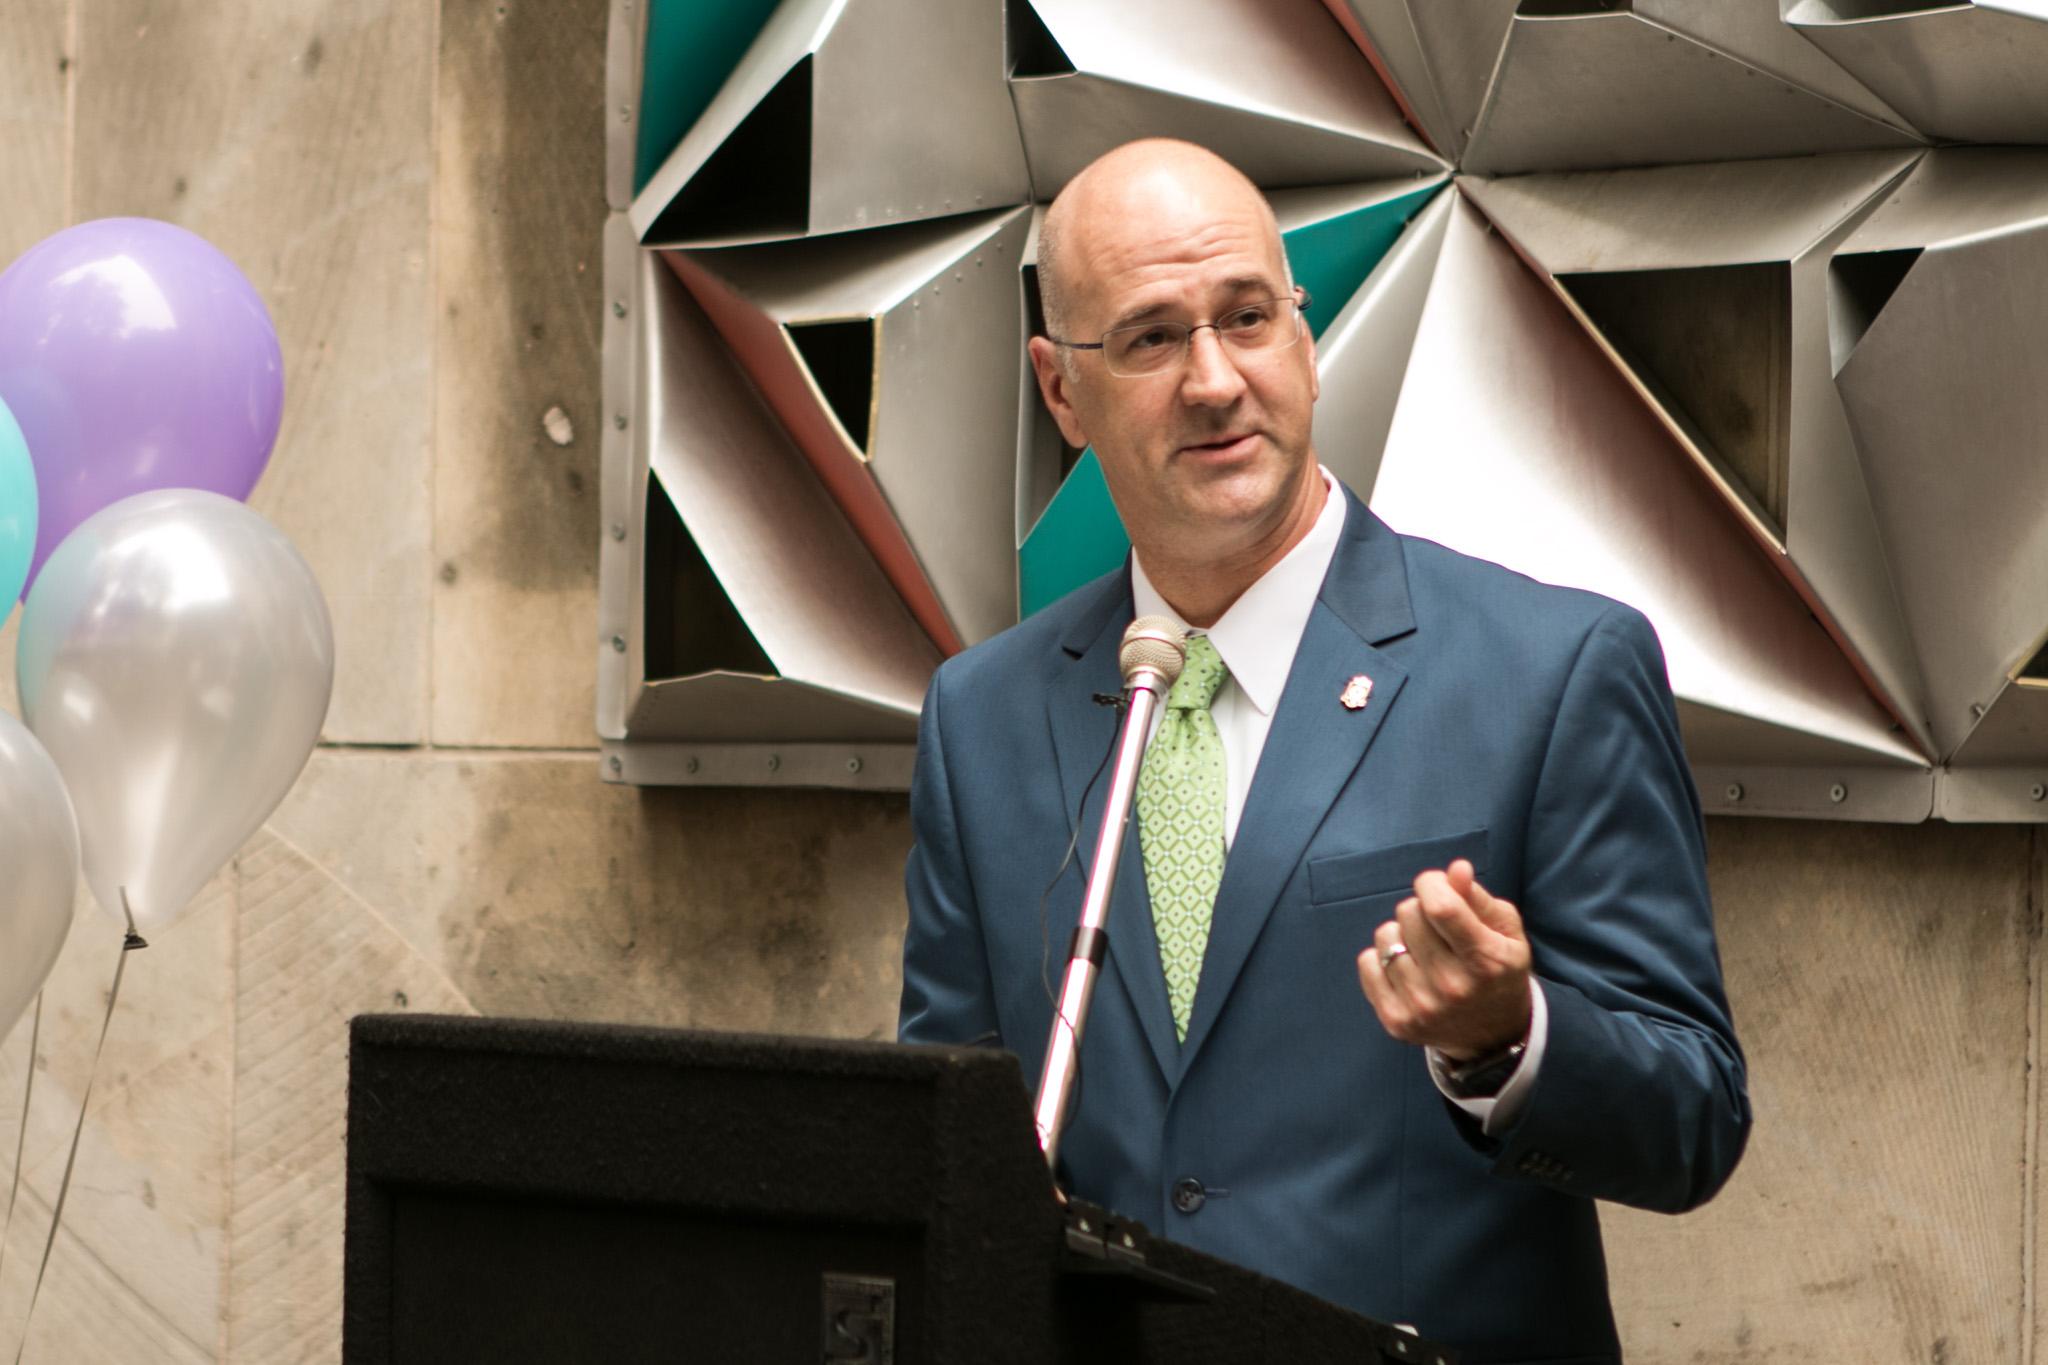 Center City Development and Operations Department Interim Director John Jacks explains how the Virtual Valet app works.